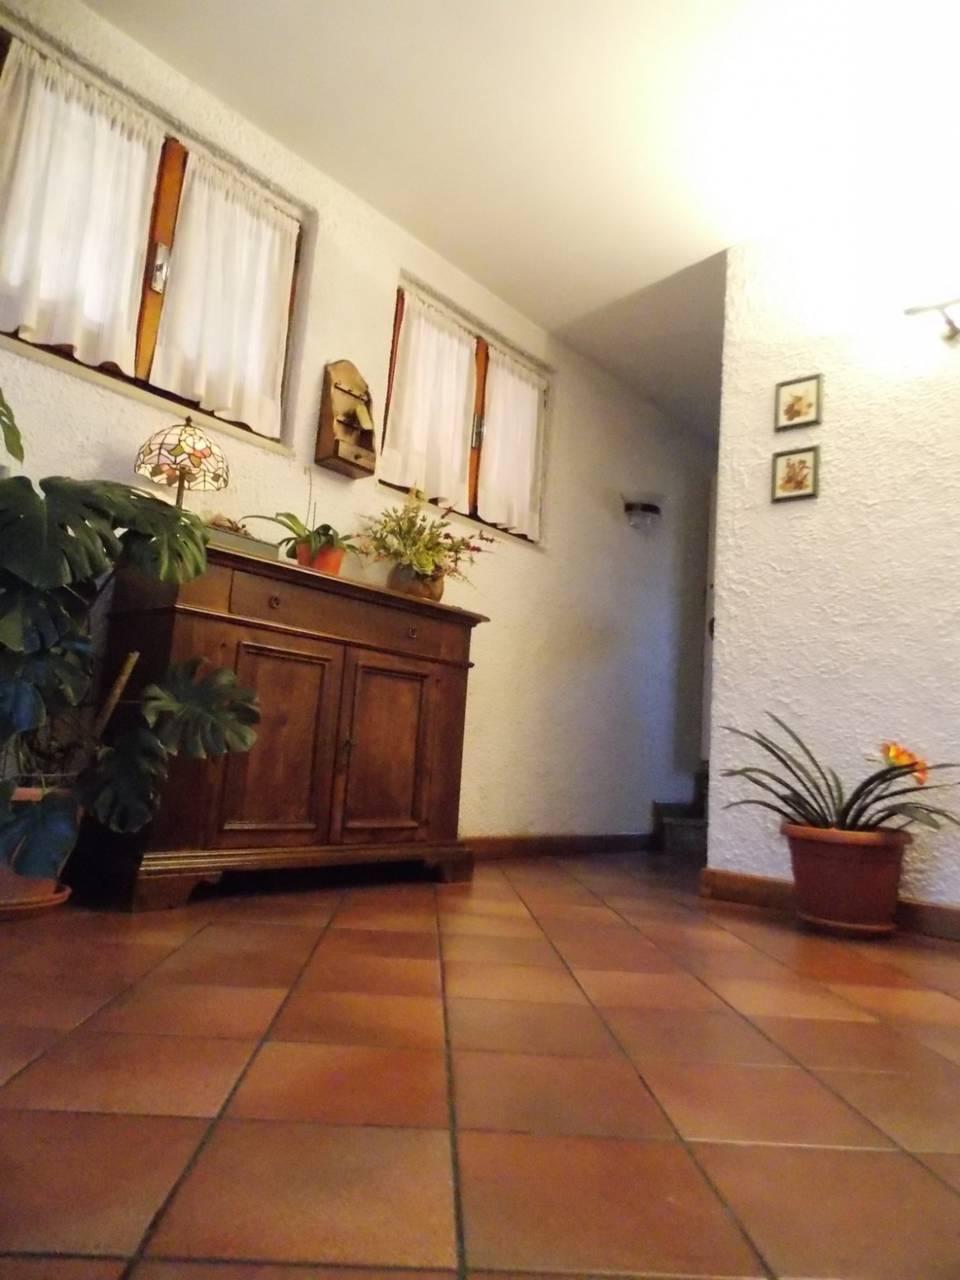 Villa-a-San-Giuliano-Milanese-in-Sesto-Ulteriano-25